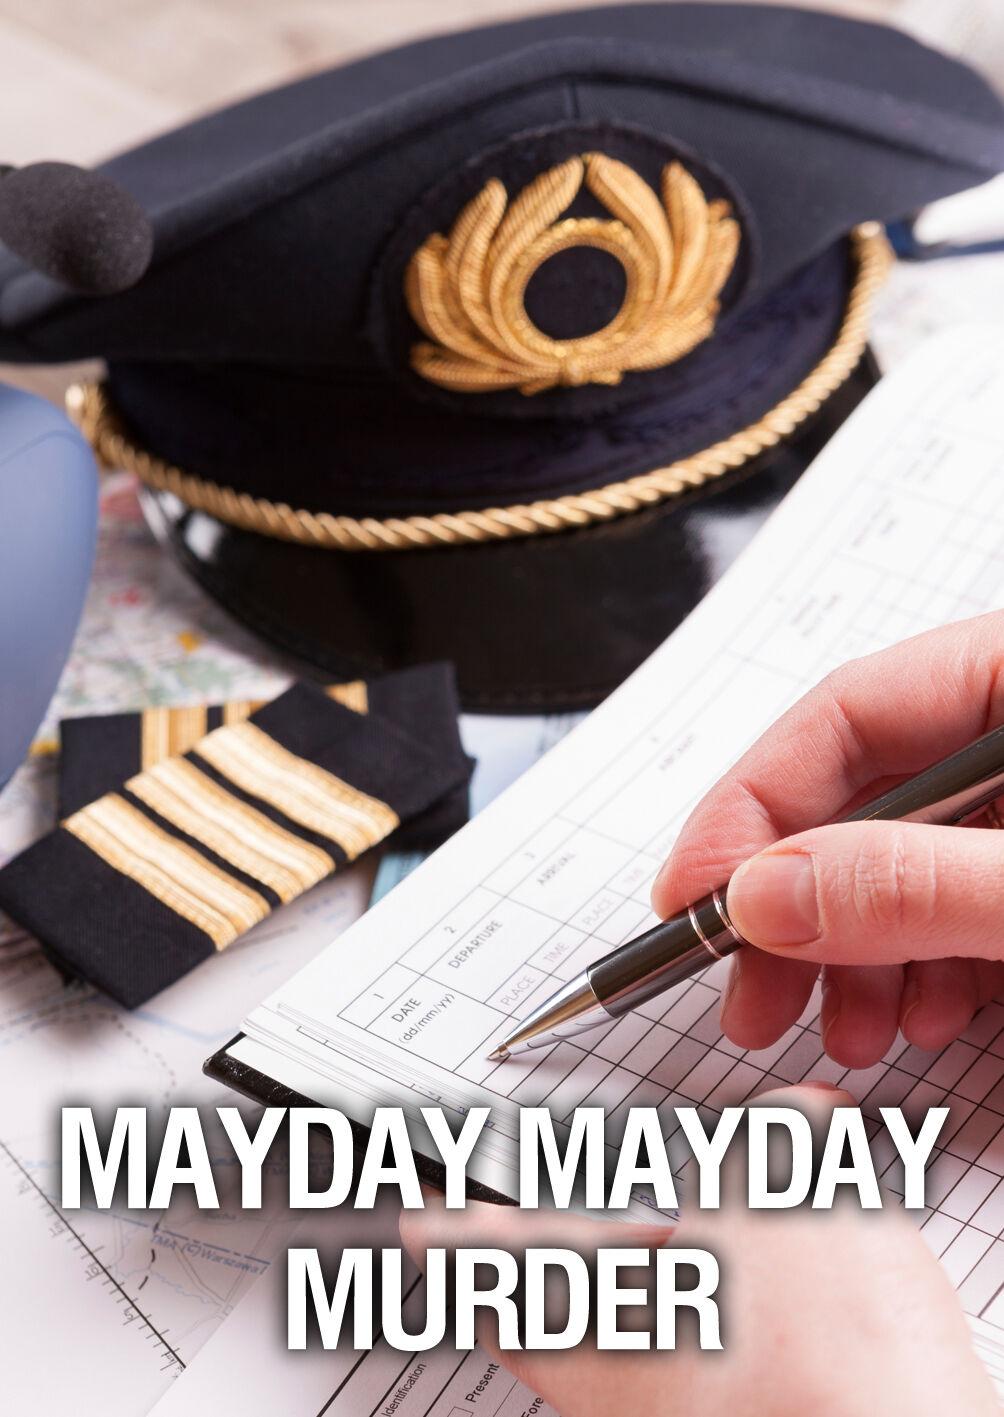 Mayday, mayday mord - 6, 8, 10, 12 spieler spielen